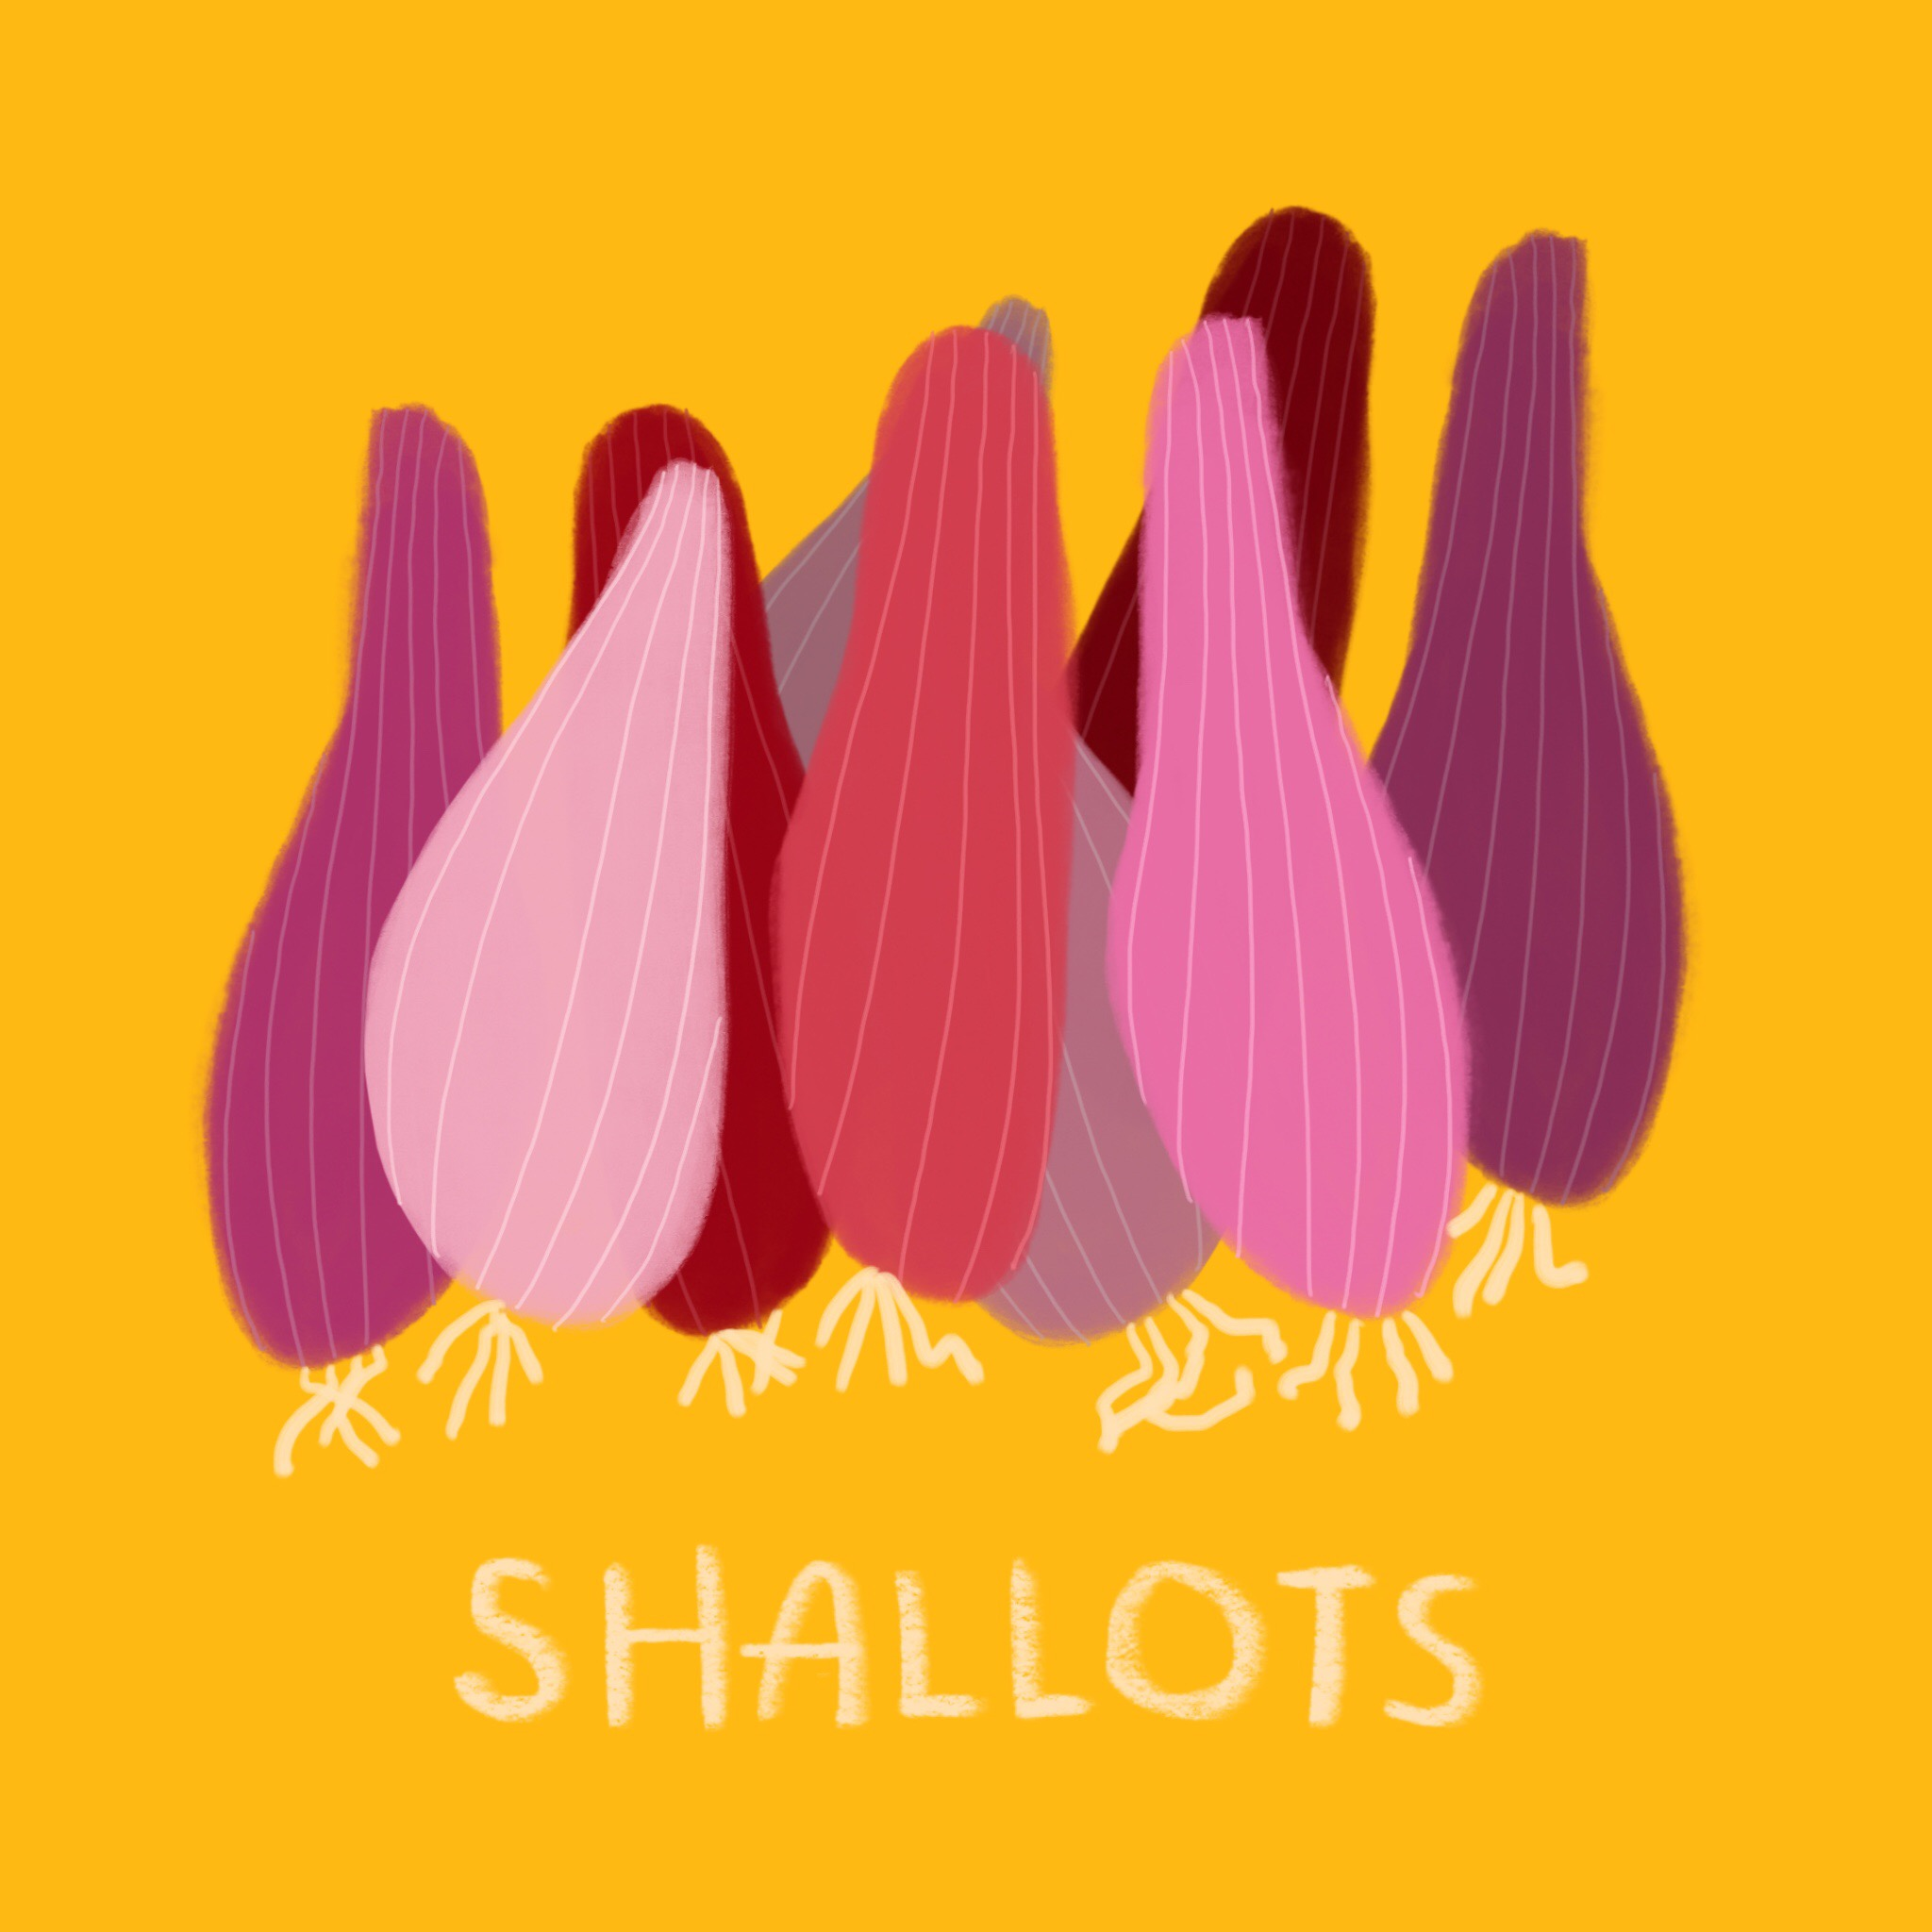 74_-_Shallots.jpg